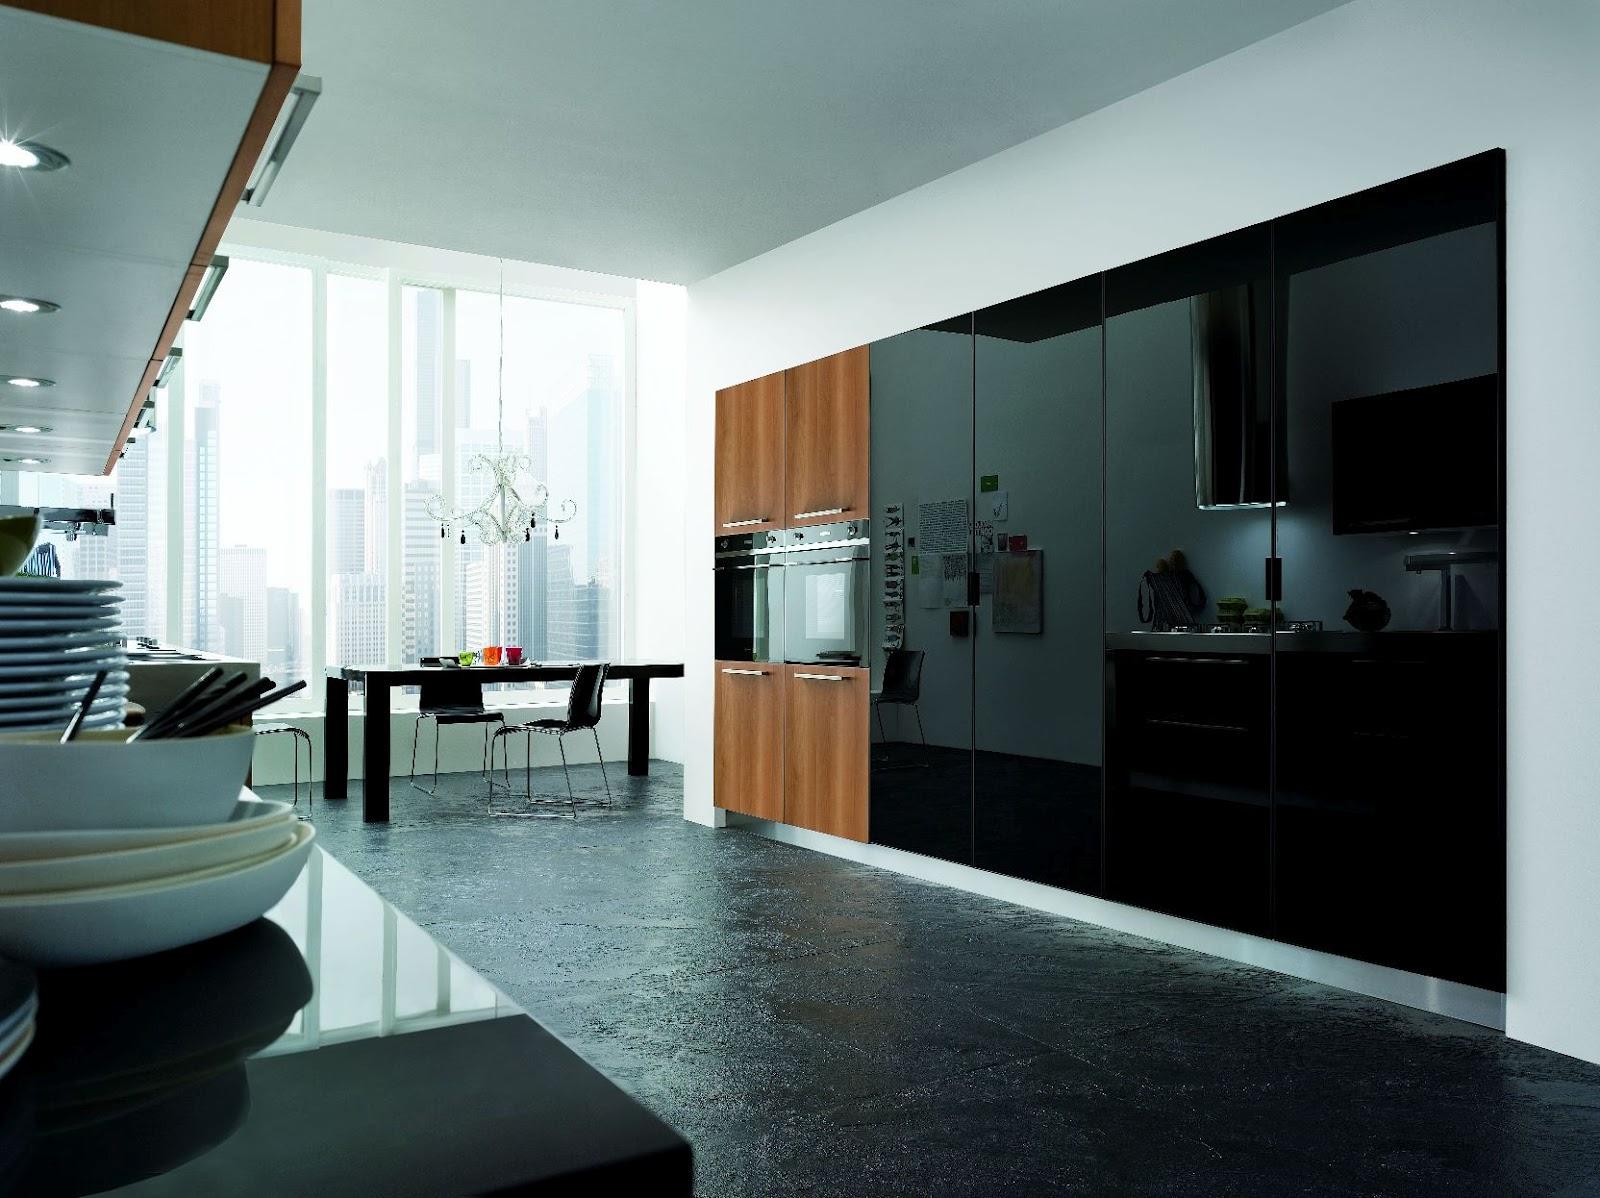 cuisine en verre noir et bois. Black Bedroom Furniture Sets. Home Design Ideas